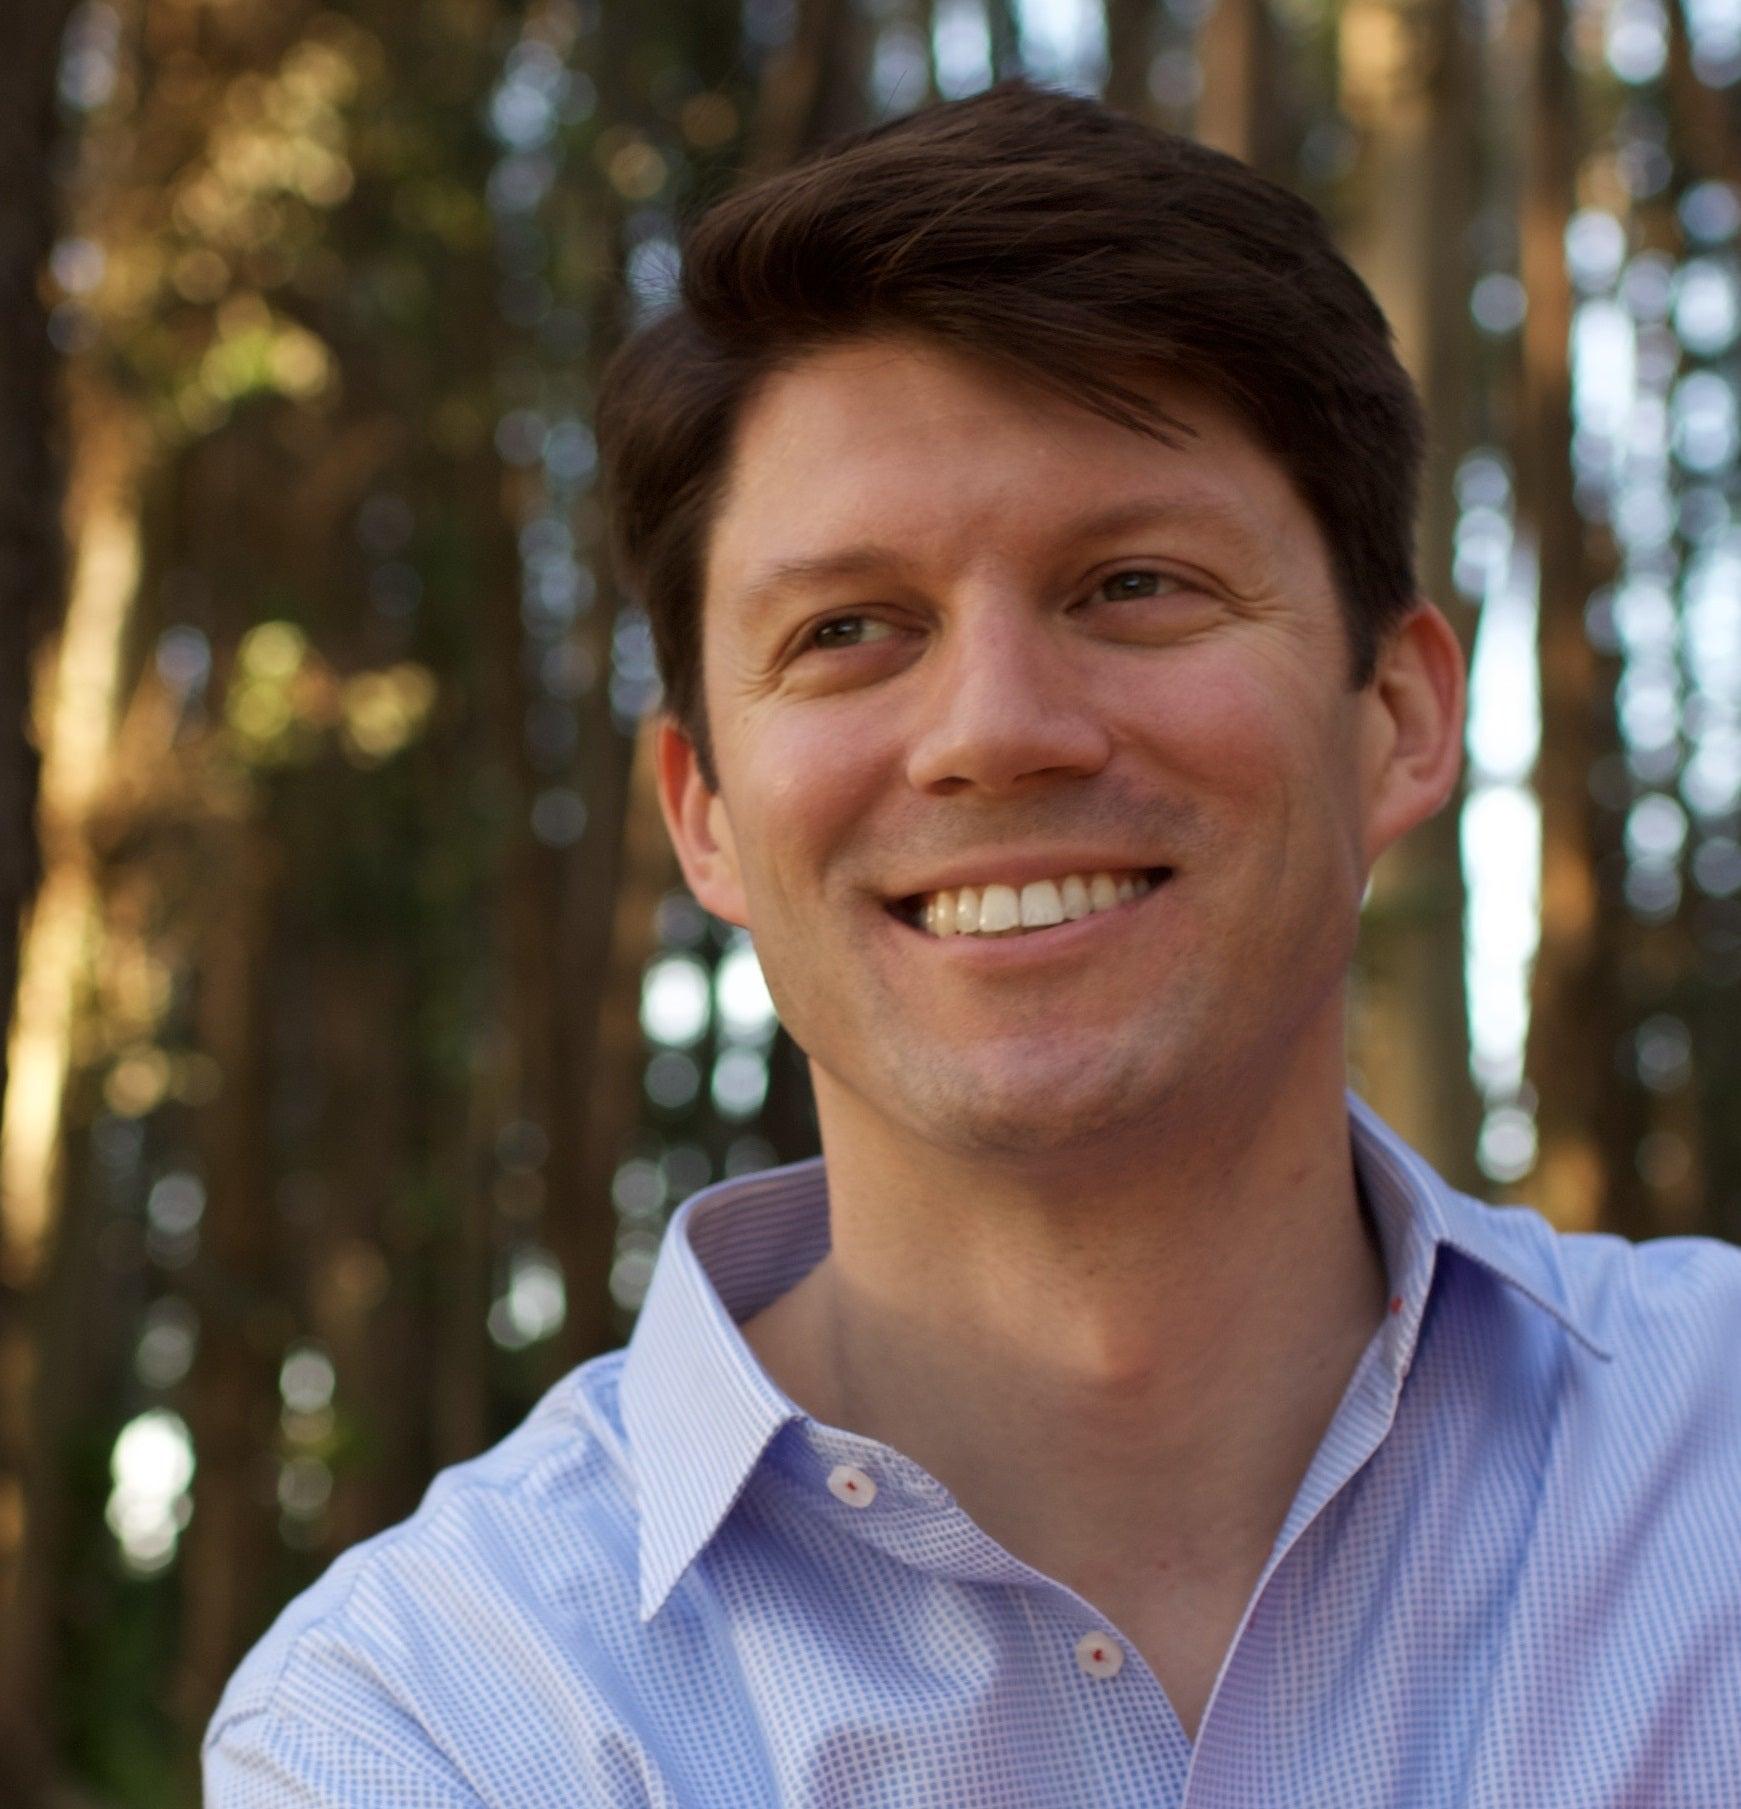 Photo of Adam Groomis